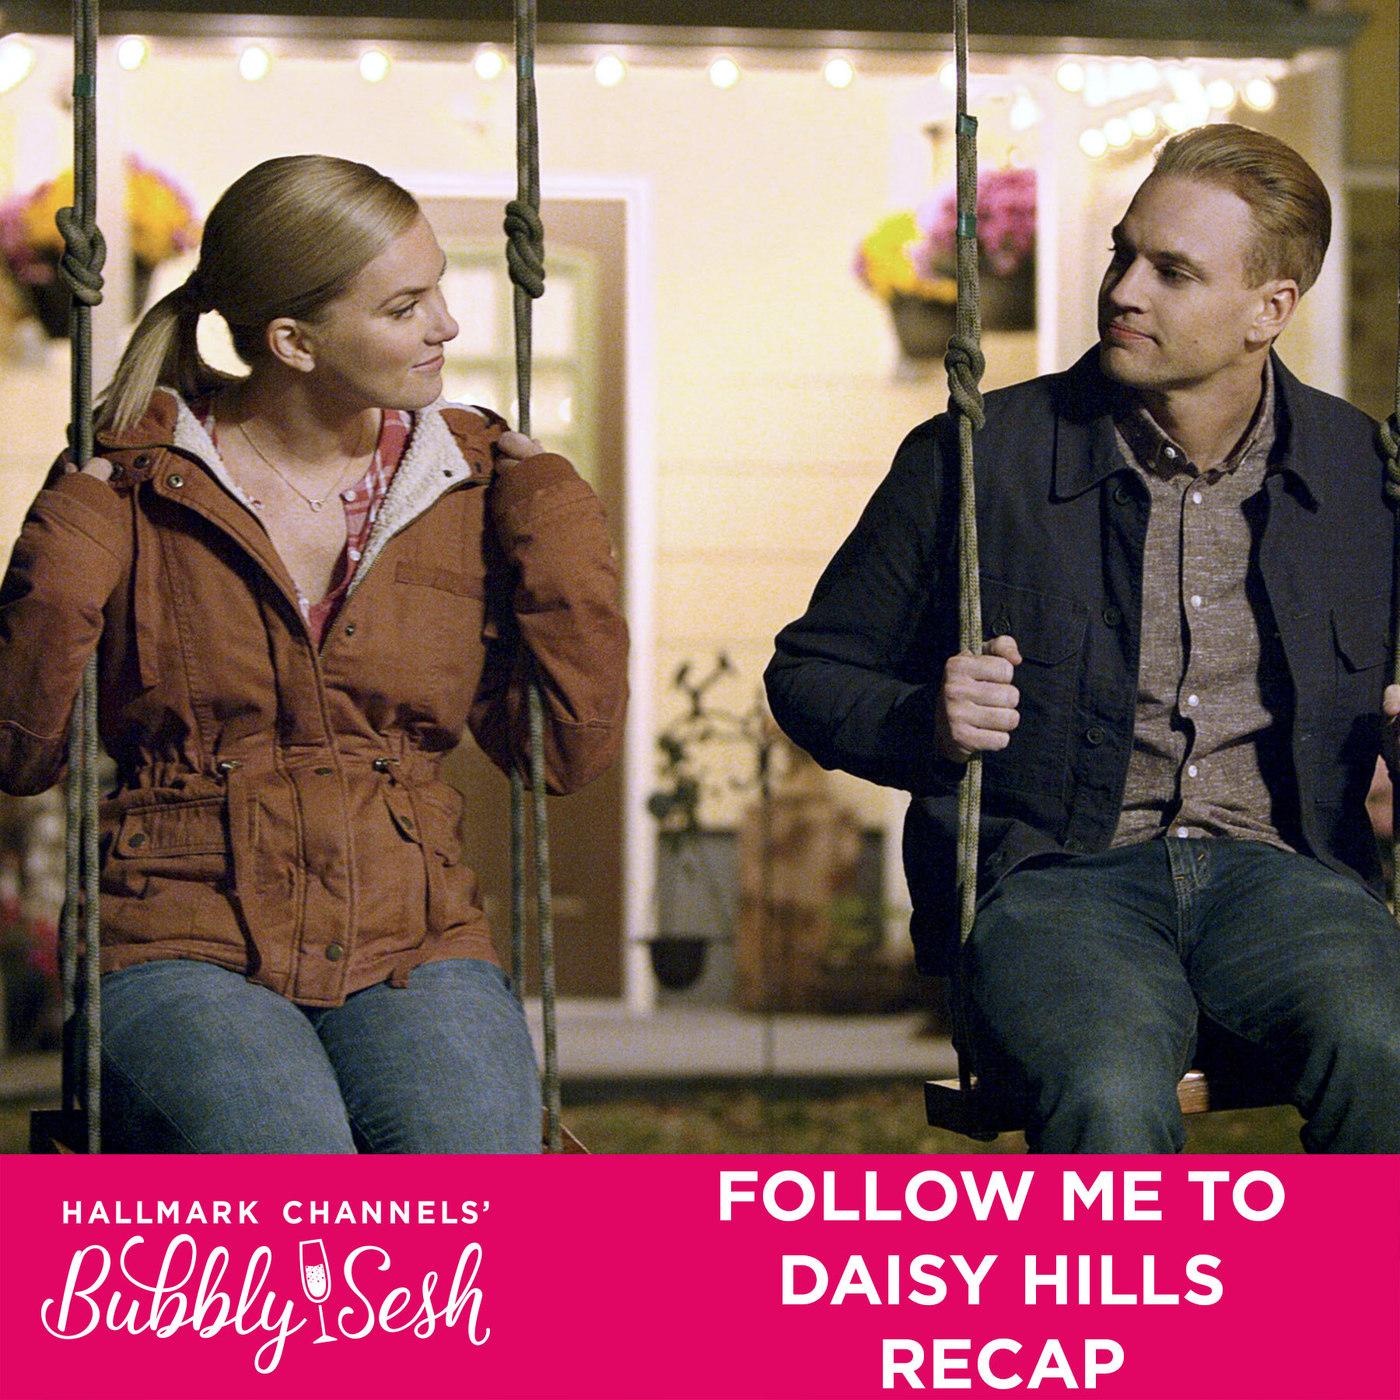 Follow Me to Daisy Hills Recap